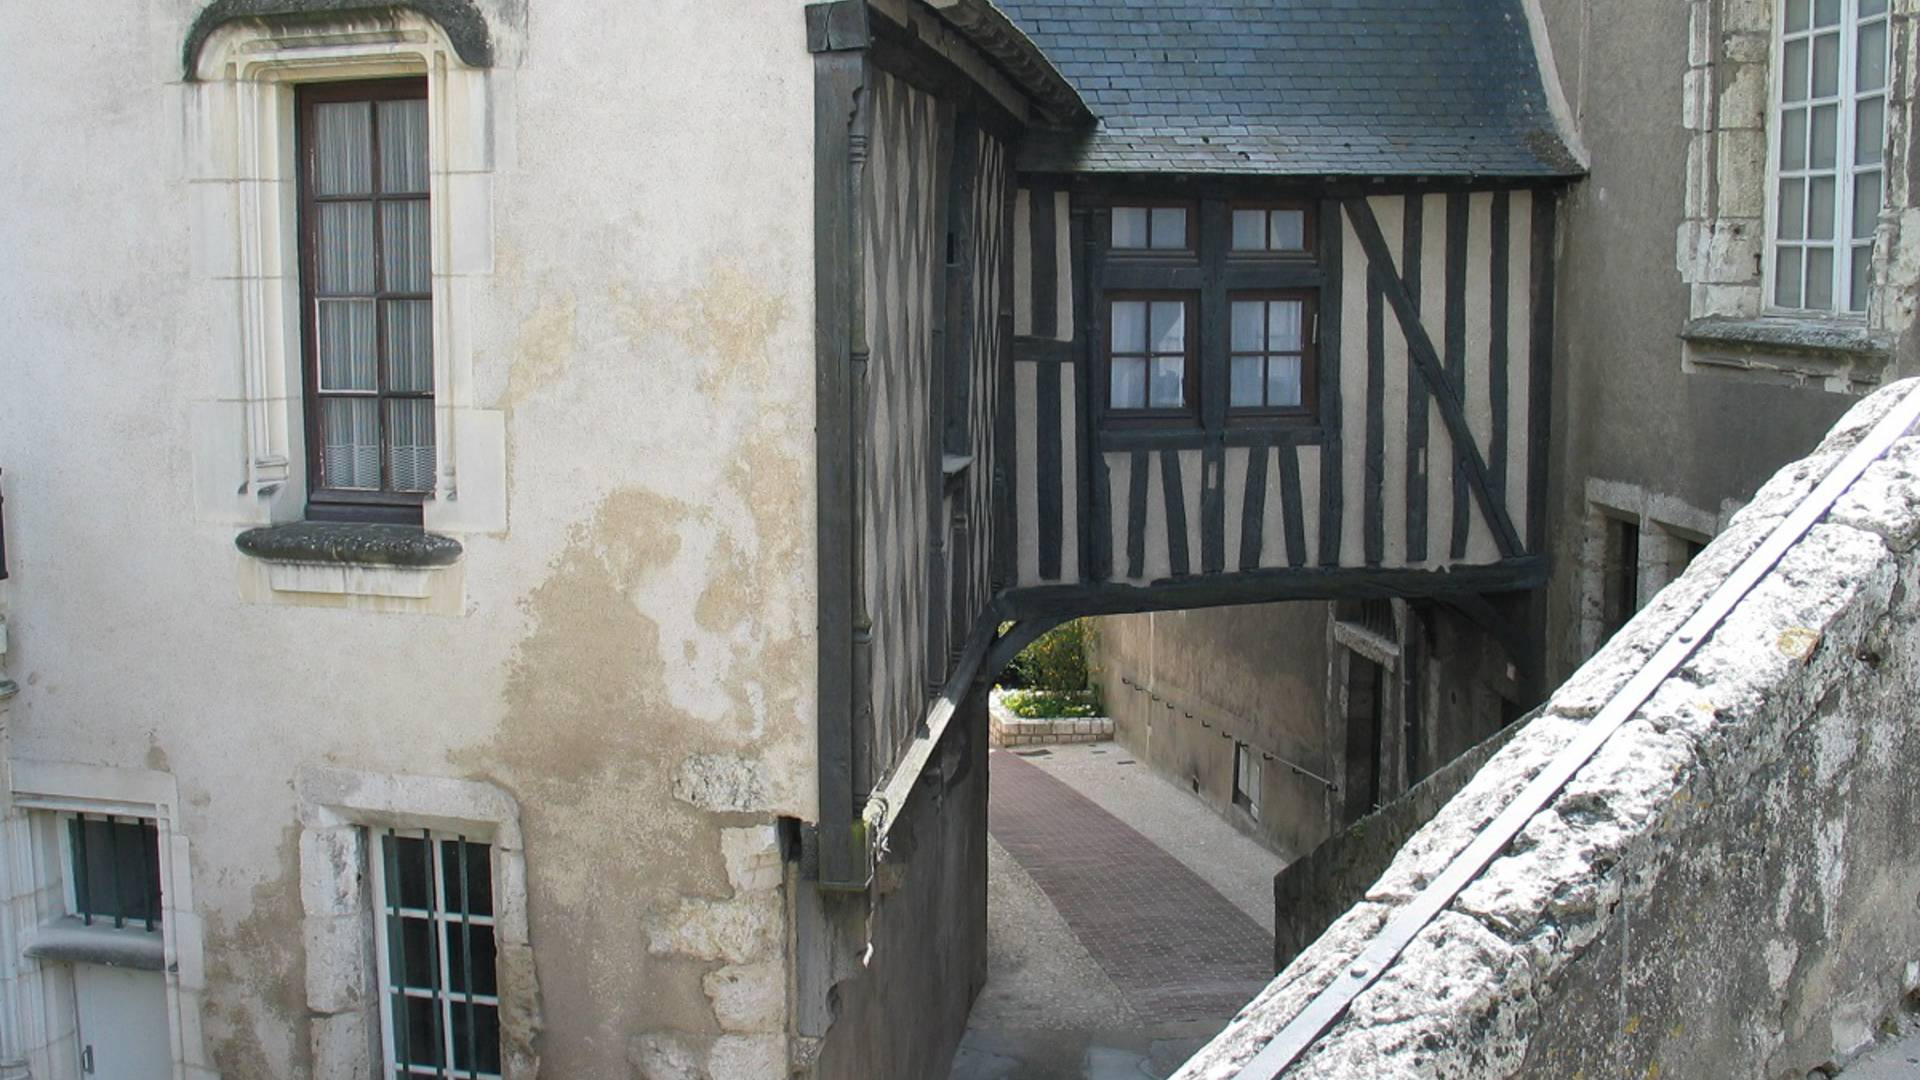 Ehemaliges Herrenhaus in Blois